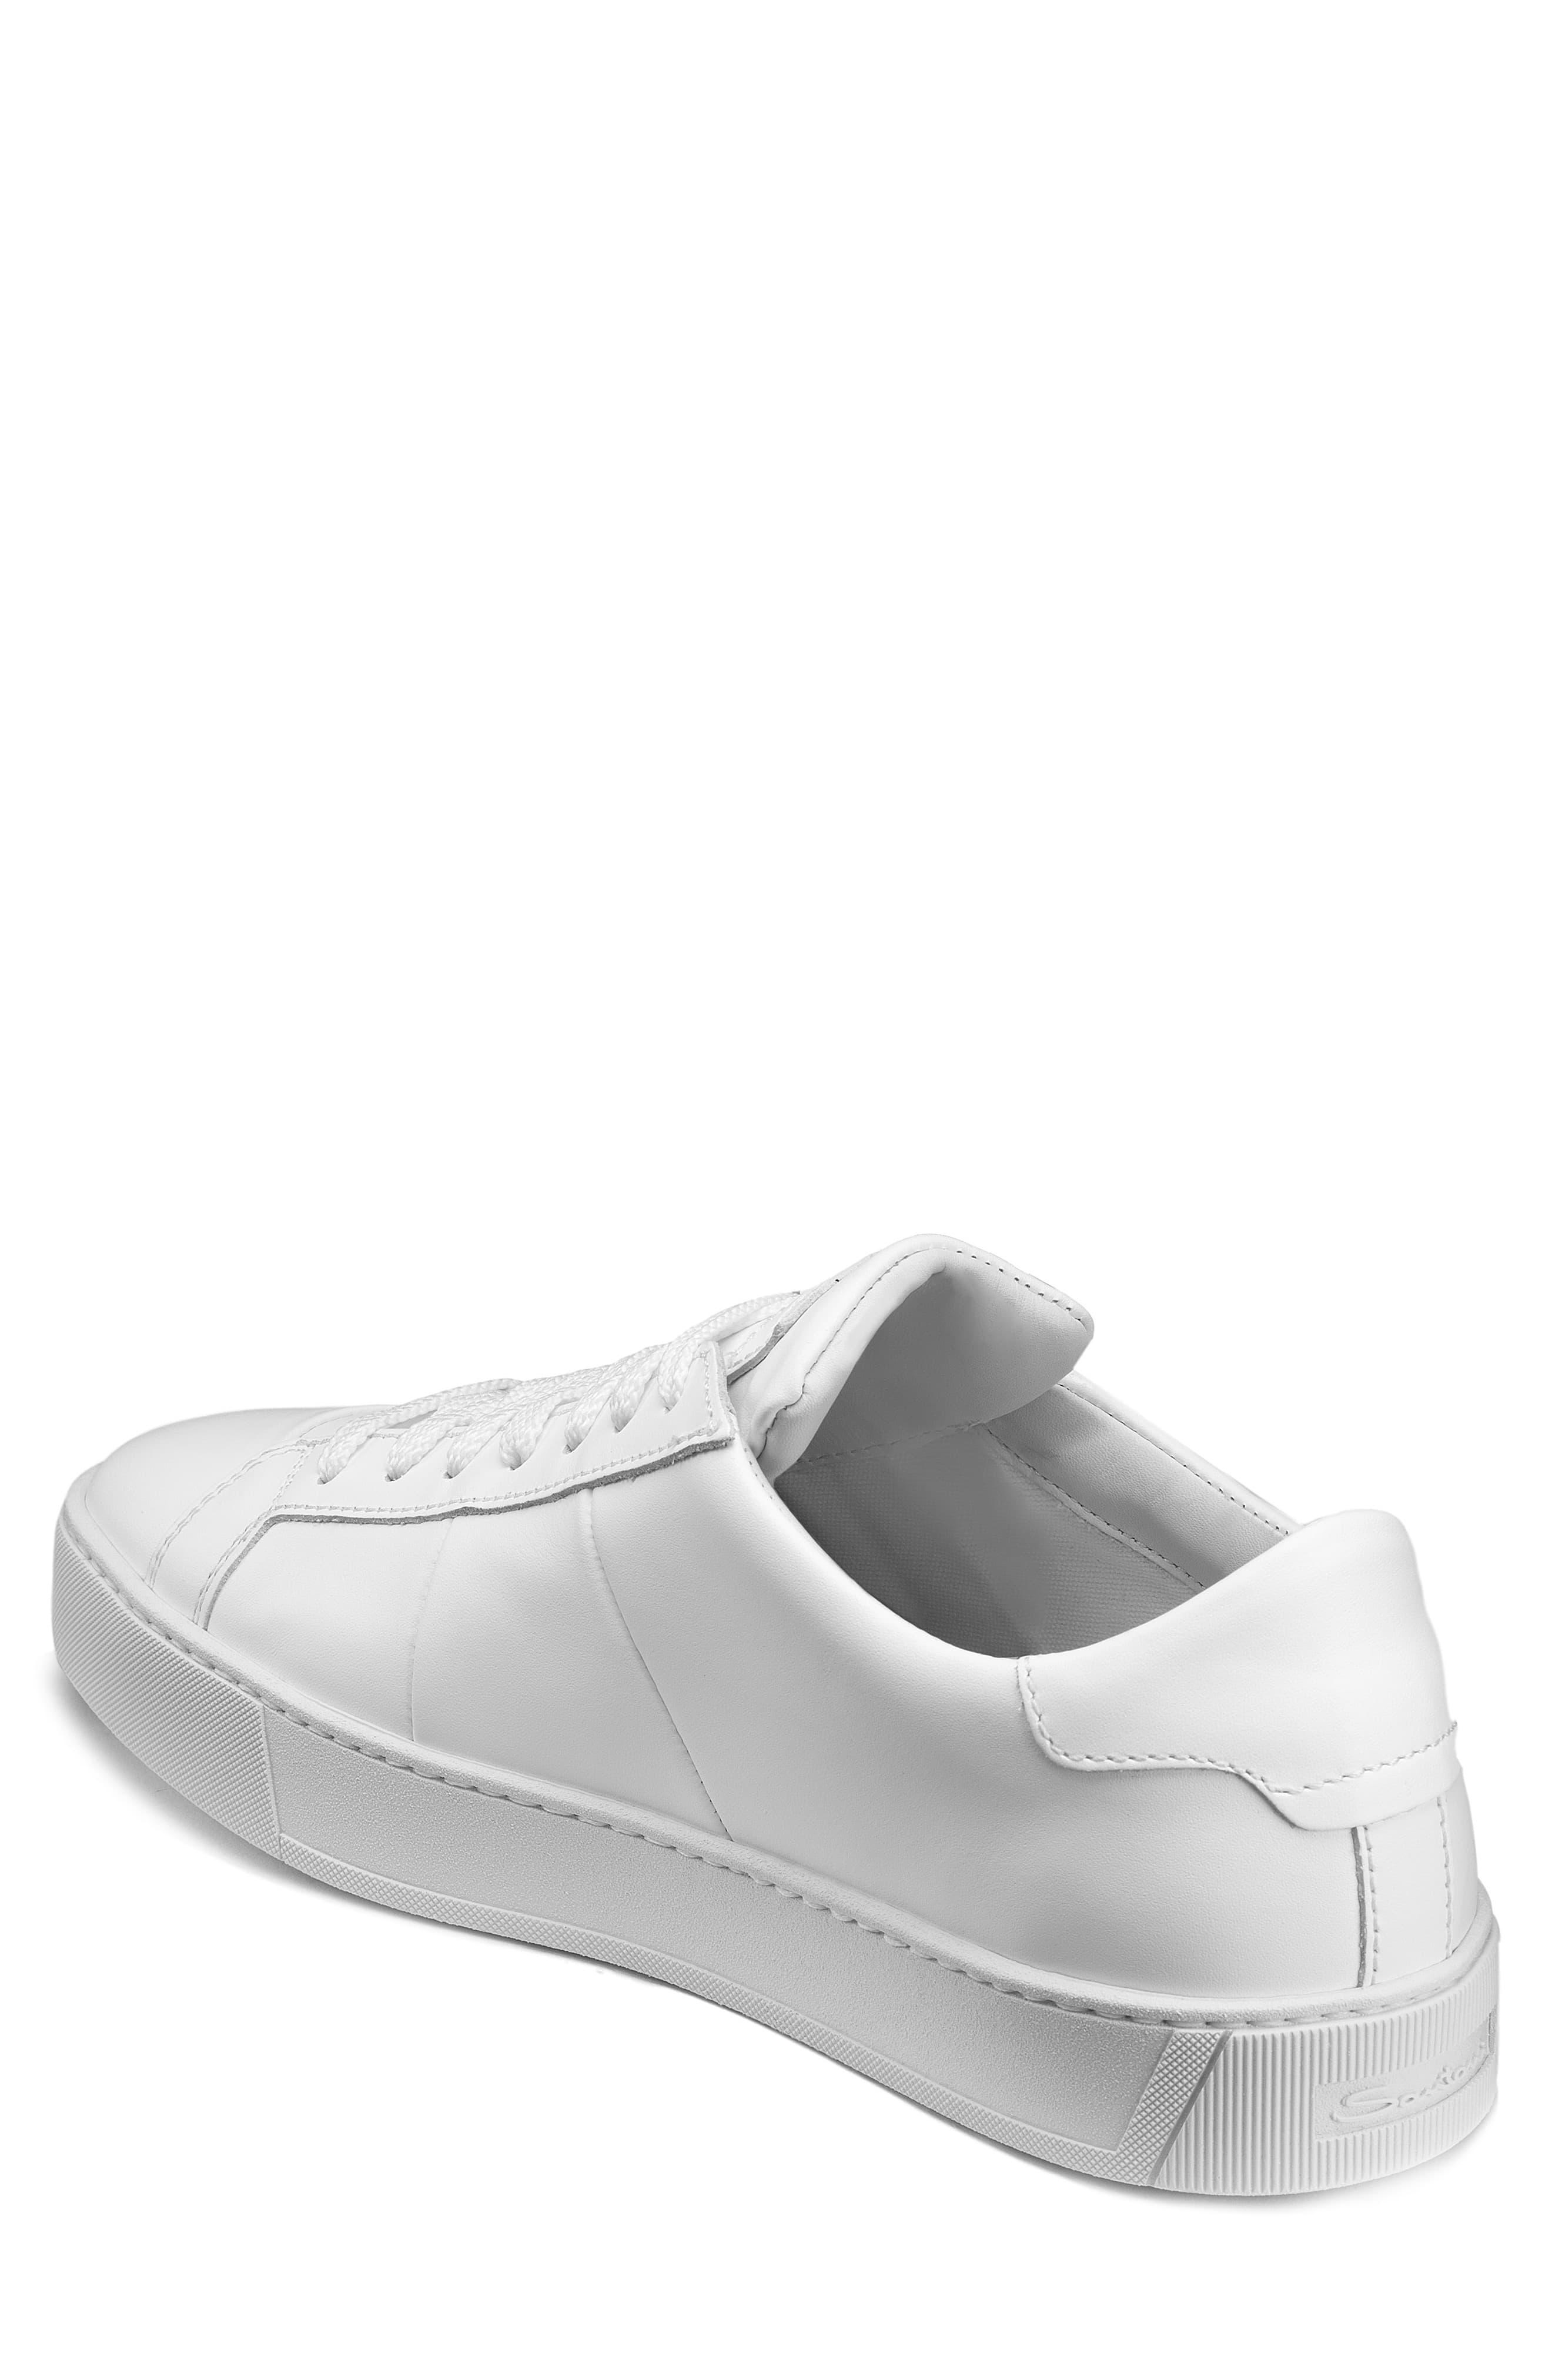 Santoni Leather Gloria Sneaker in White